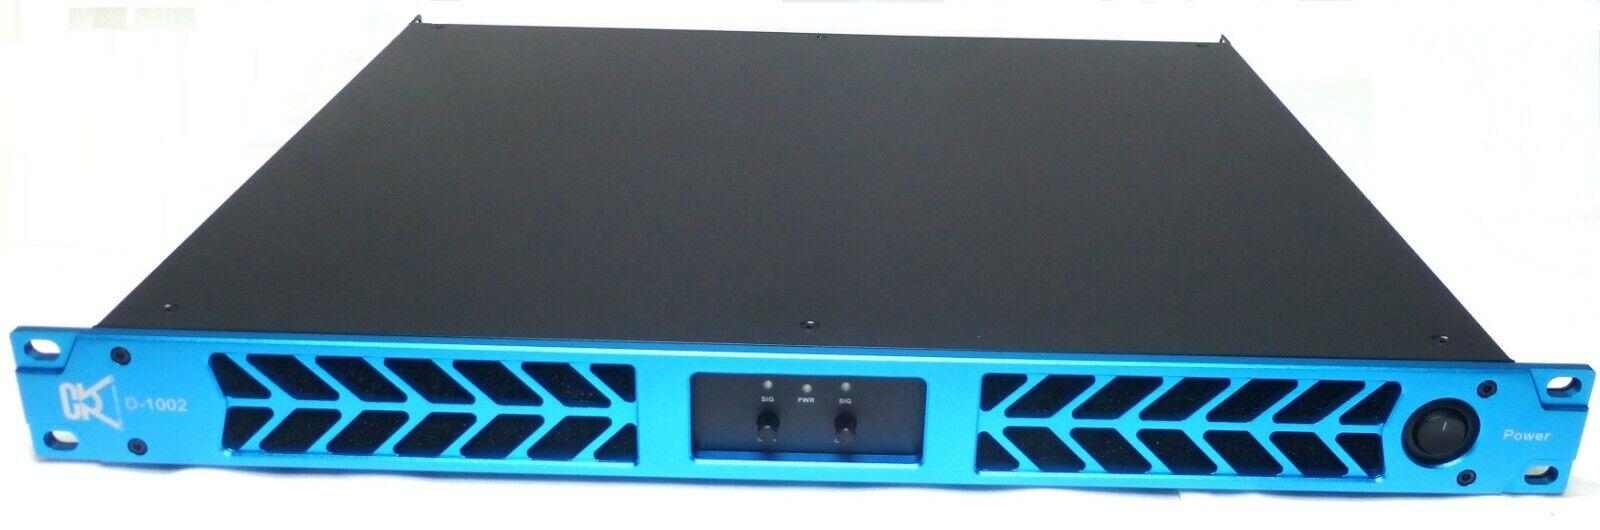 CVR D-1002 Series Professional Power Amplifier 1 Space 1000 Watts x2 at 8Ω Blau